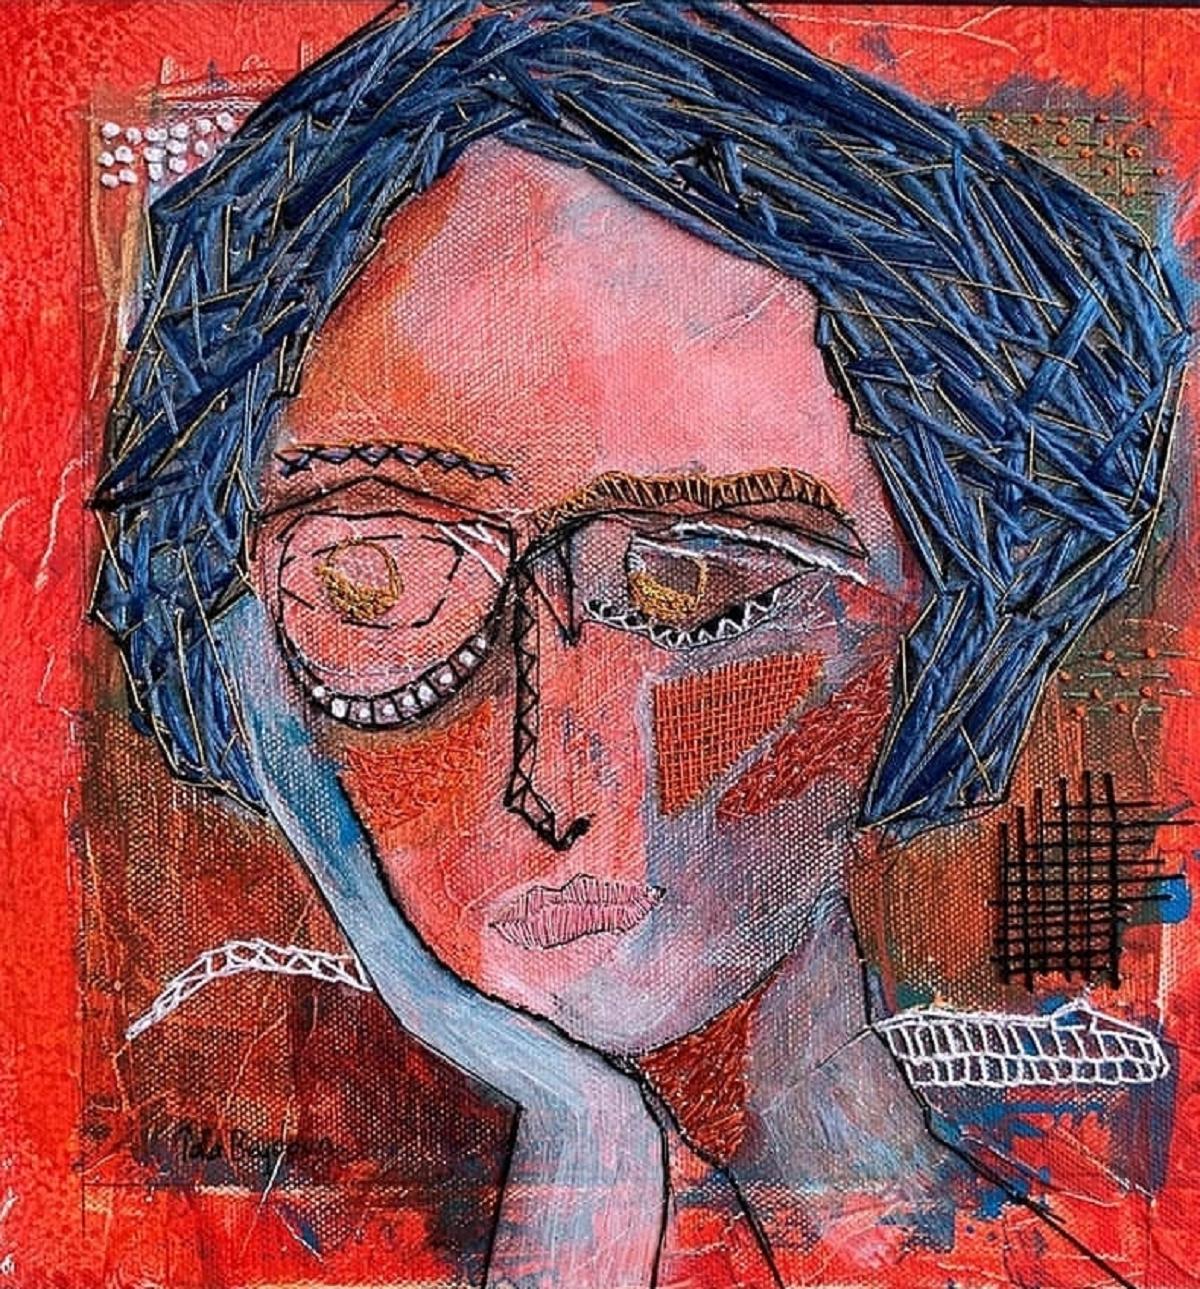 Heartbreak Mixed Media Embroidery Acrylic Painting